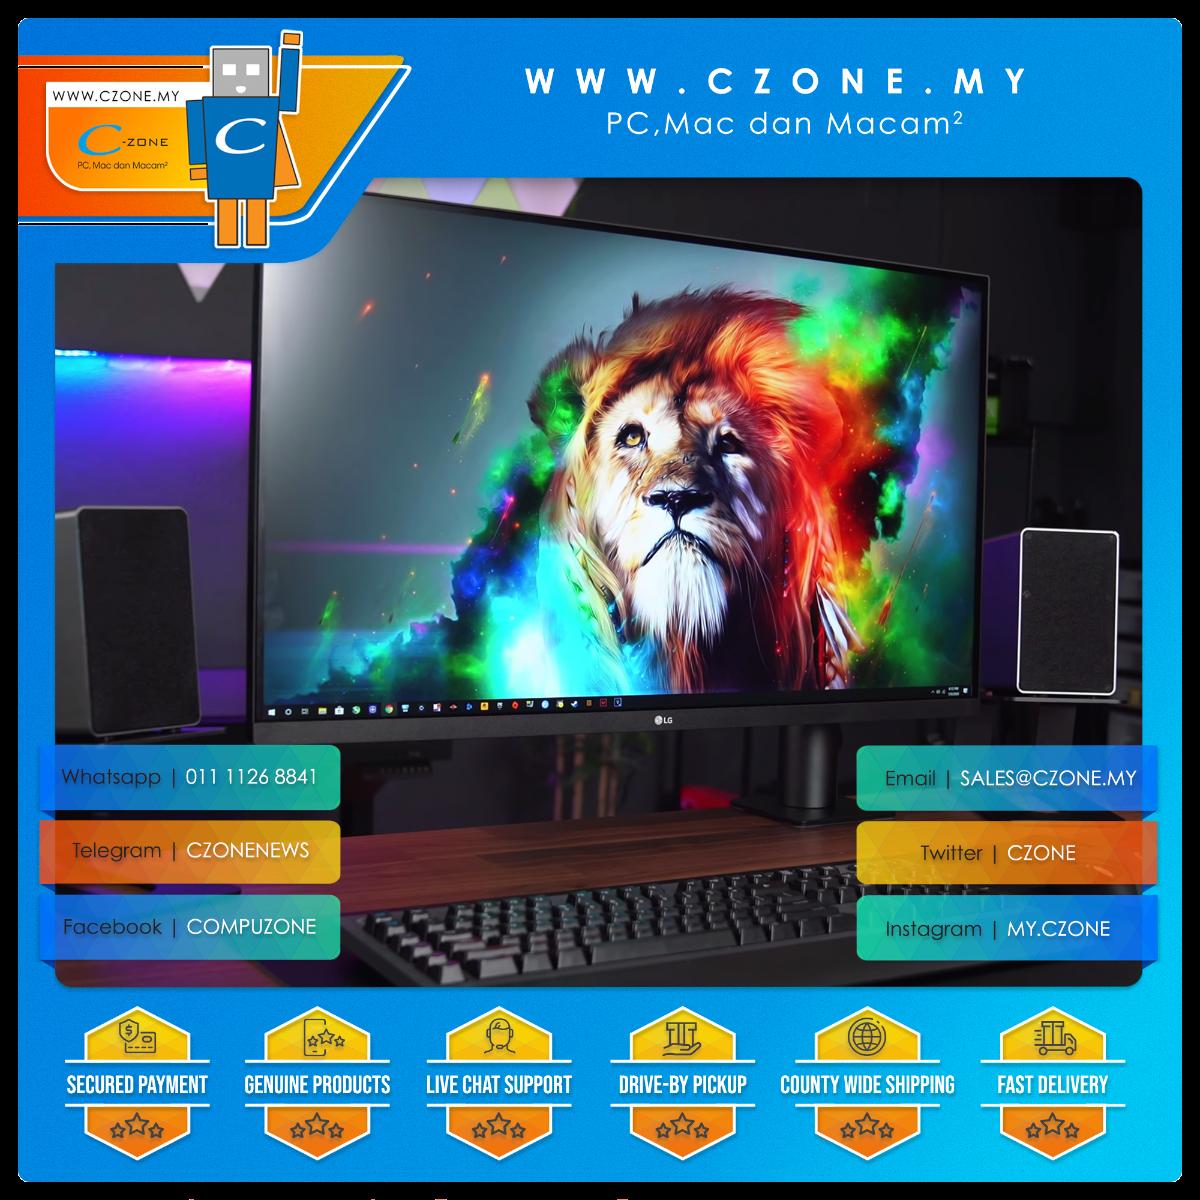 https://czone.my/czone/computer-components/monitors.html?brand=5700